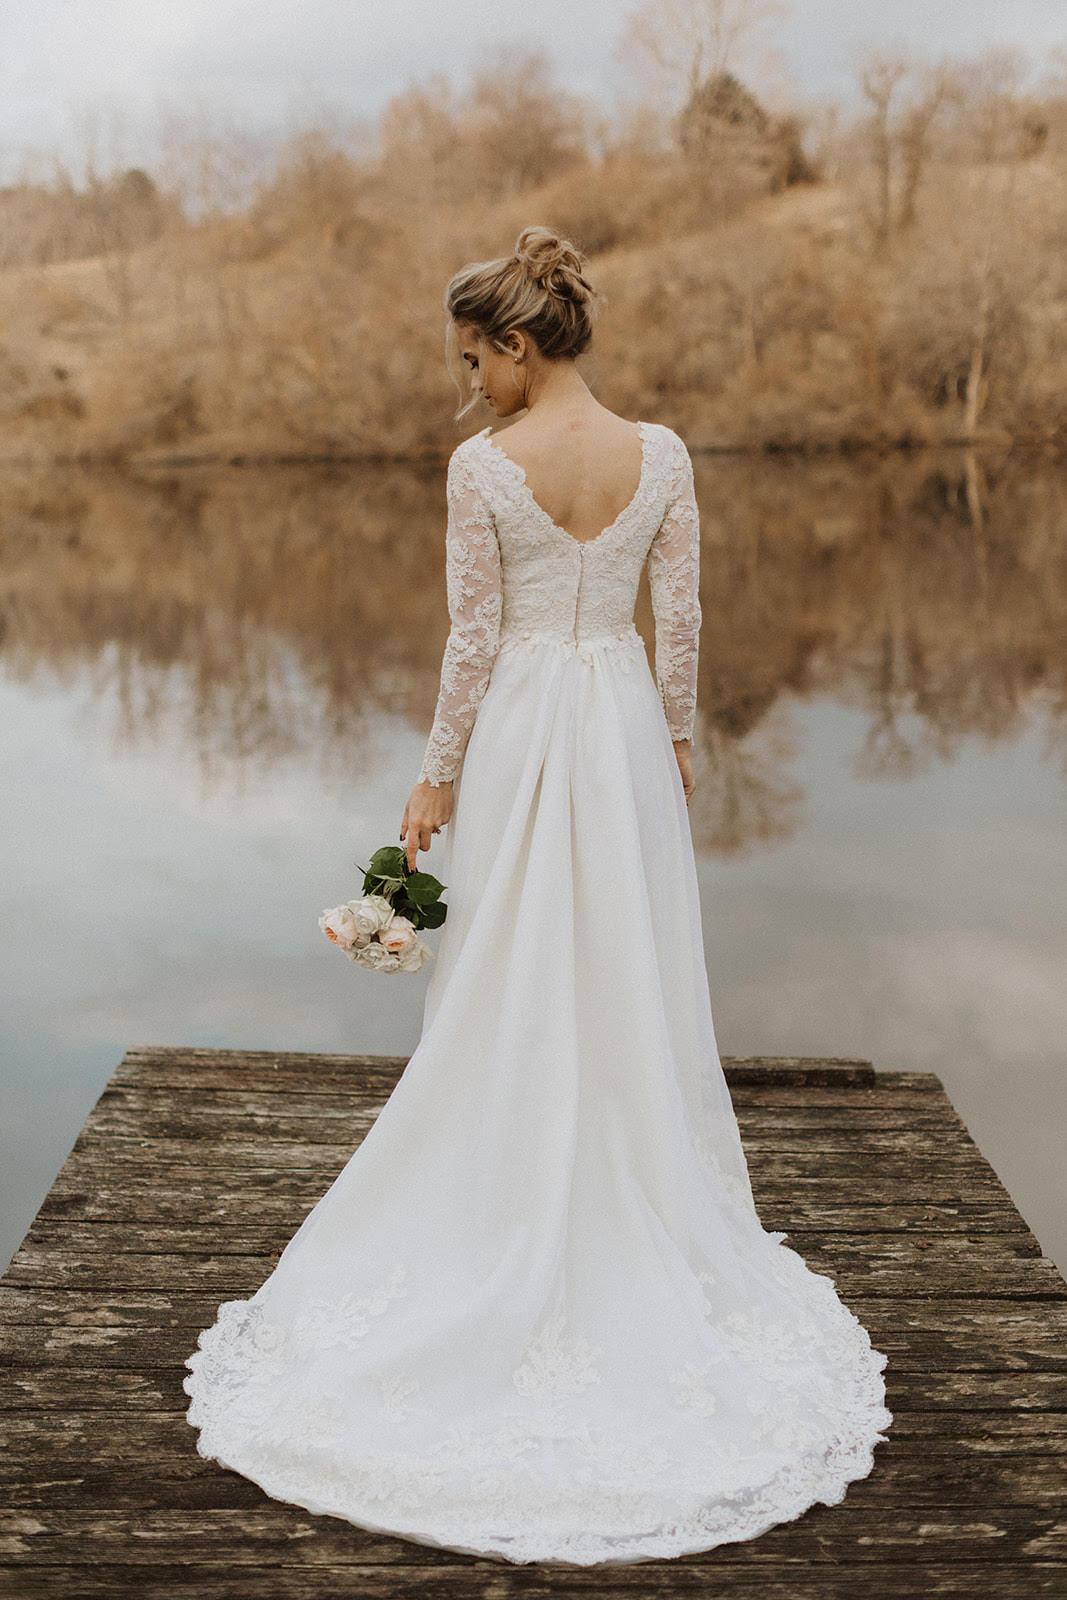 rewear-moms-wedding-dress